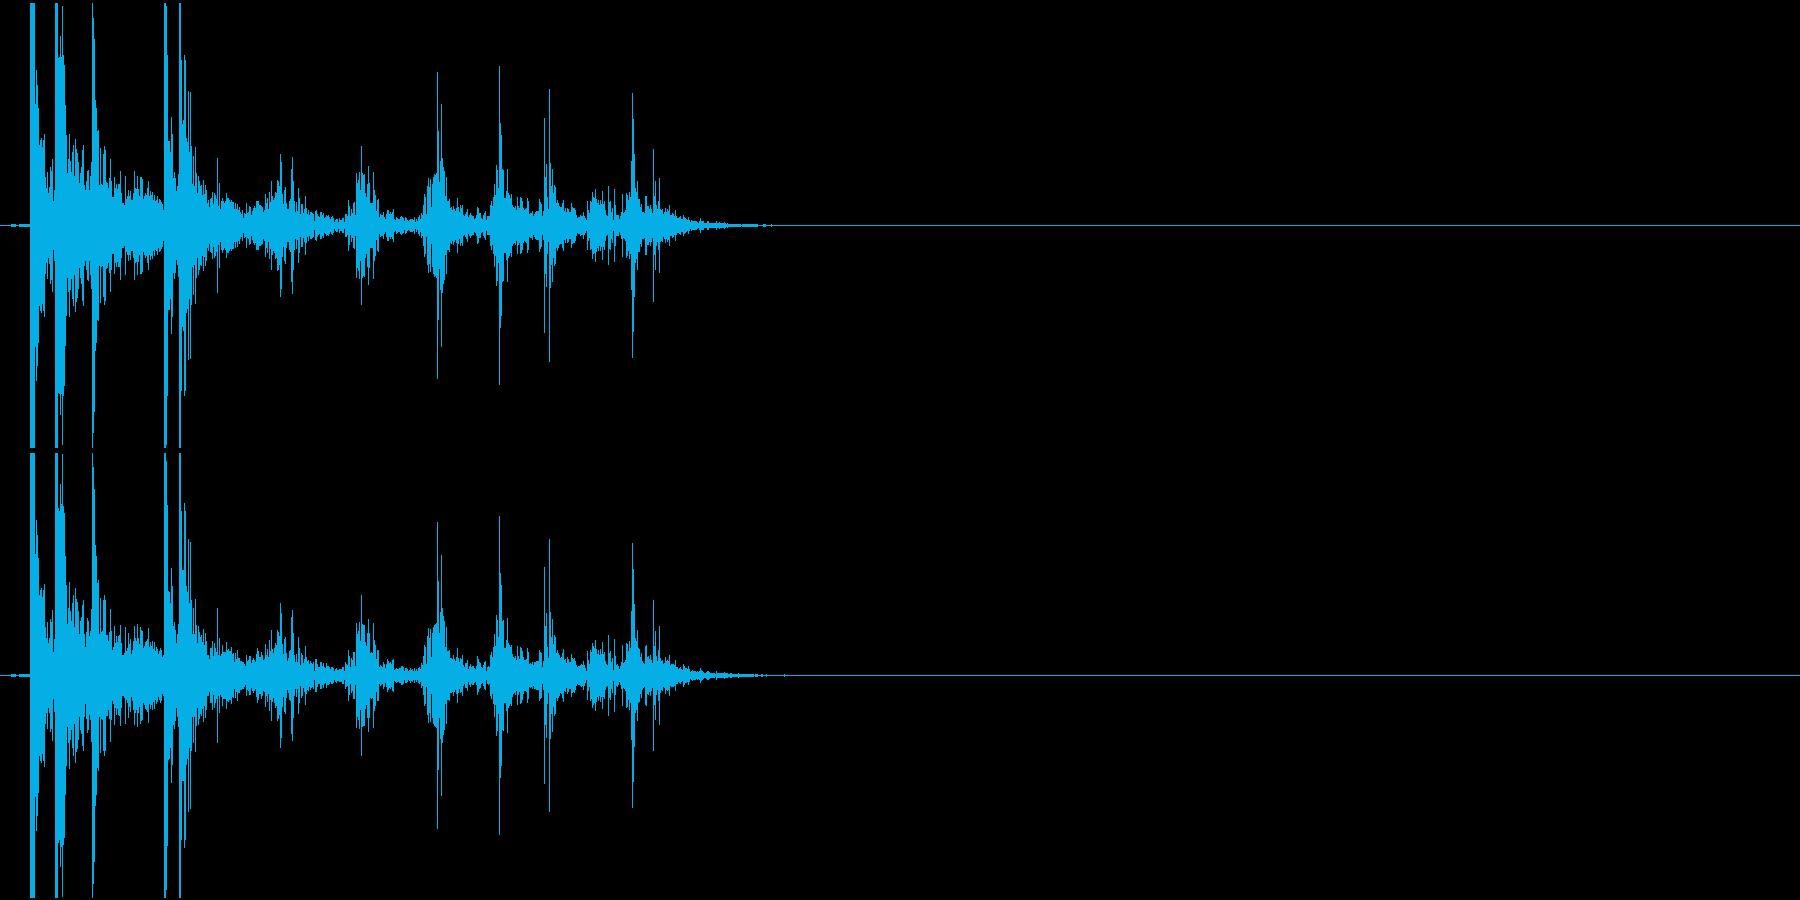 Coin 硬貨を投げ置く音 チップの再生済みの波形